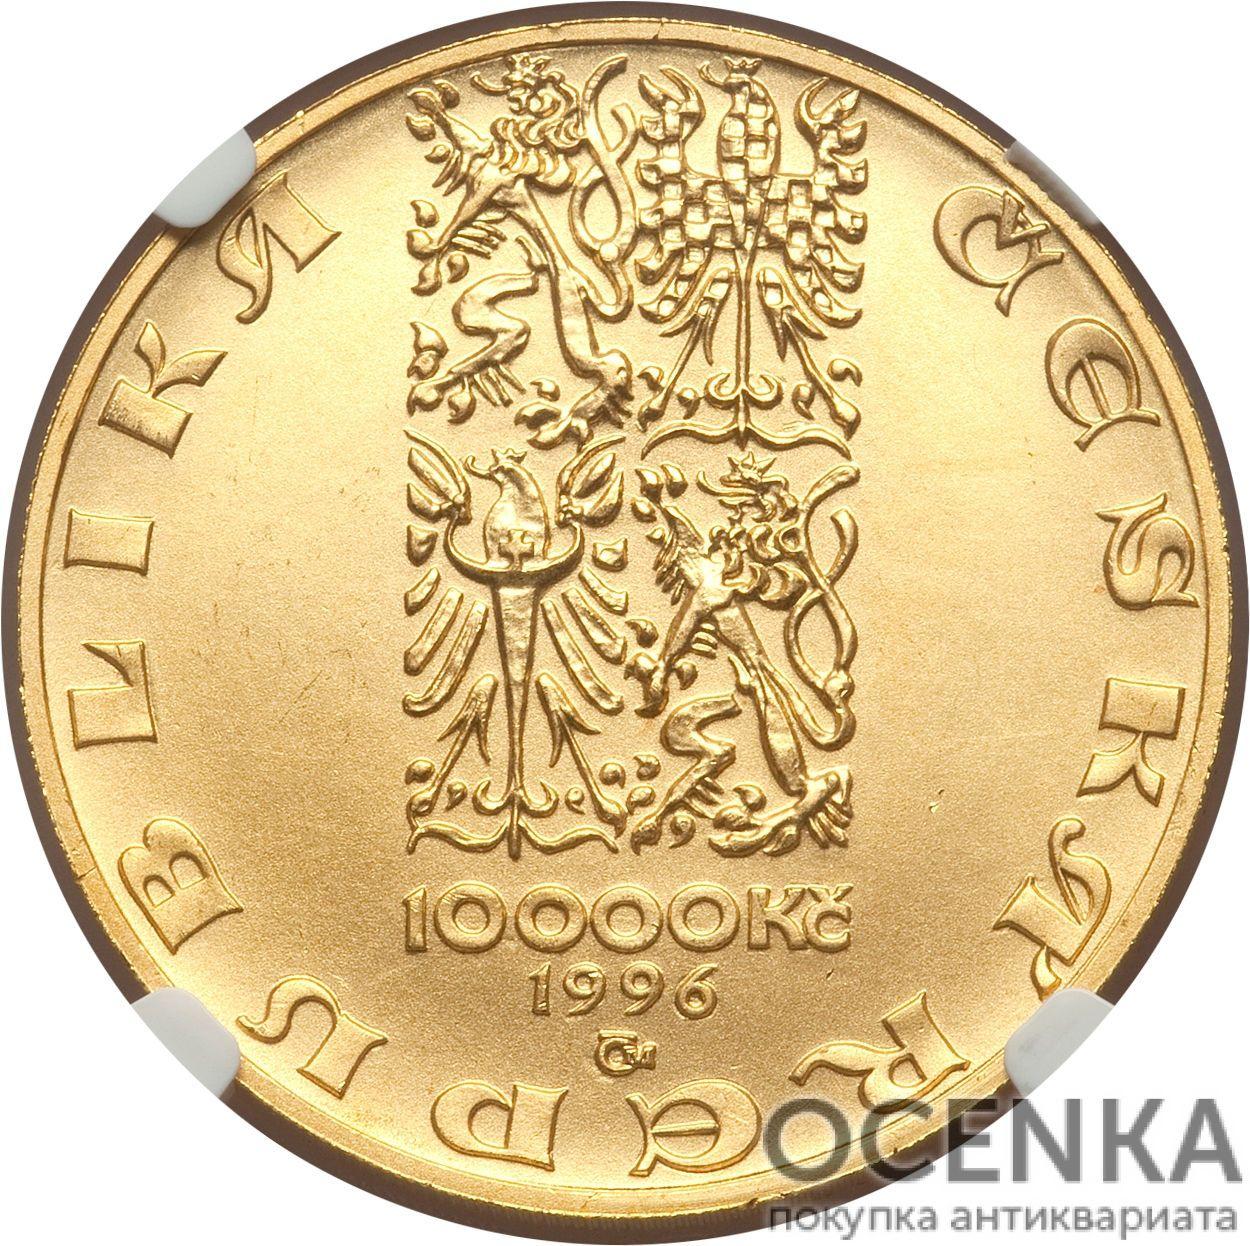 Золотая монета 10 000 Крон (10 000 Korun) Чехия - 2